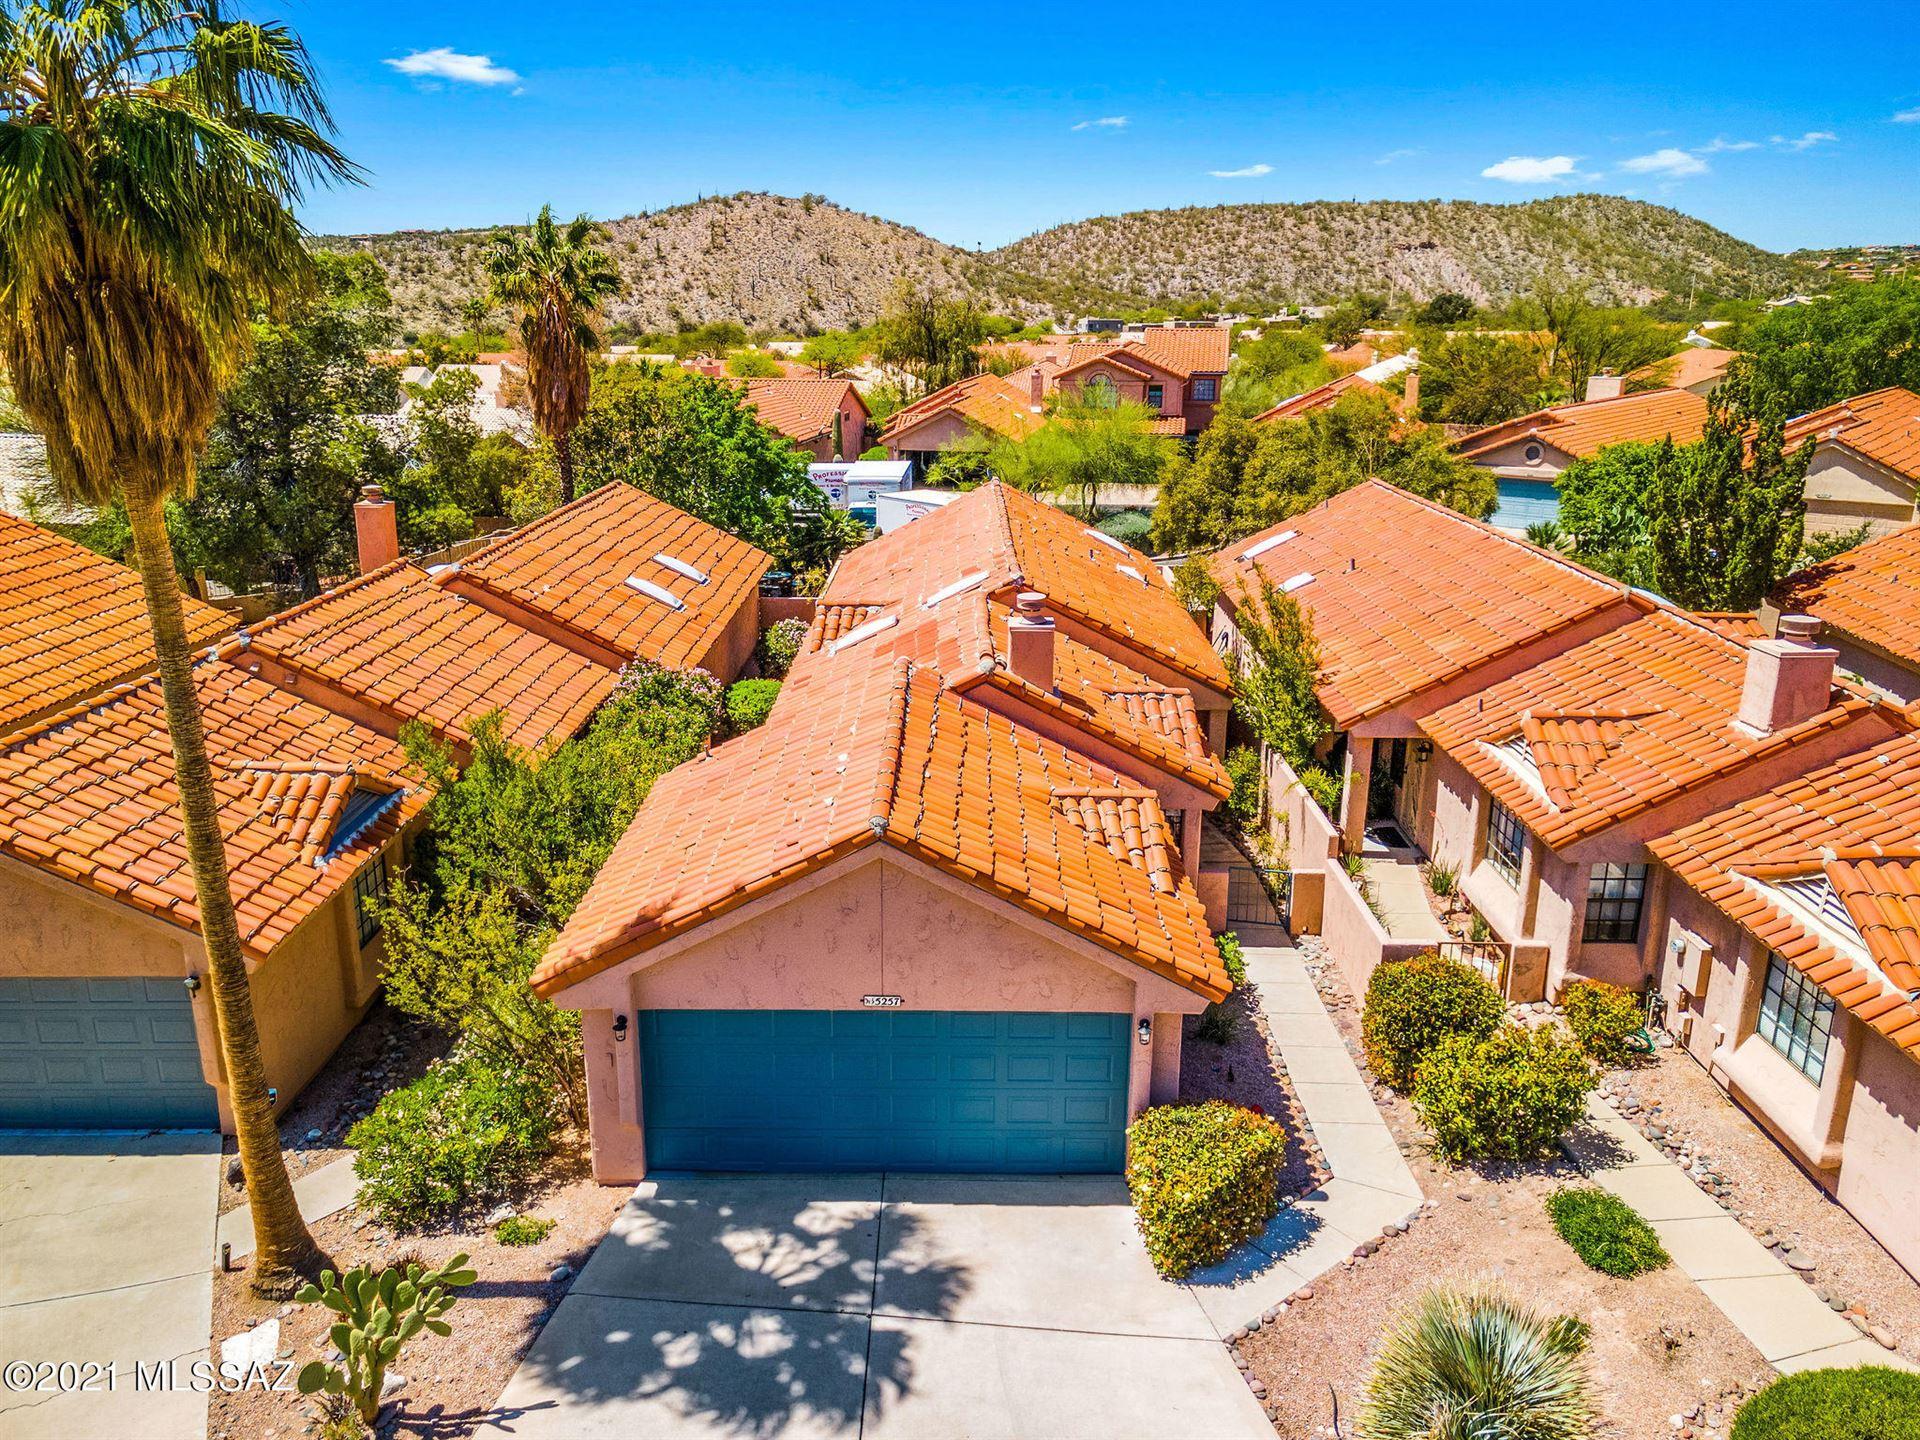 5257 N Adobe Circle, Tucson, AZ 85750 - MLS#: 22109566